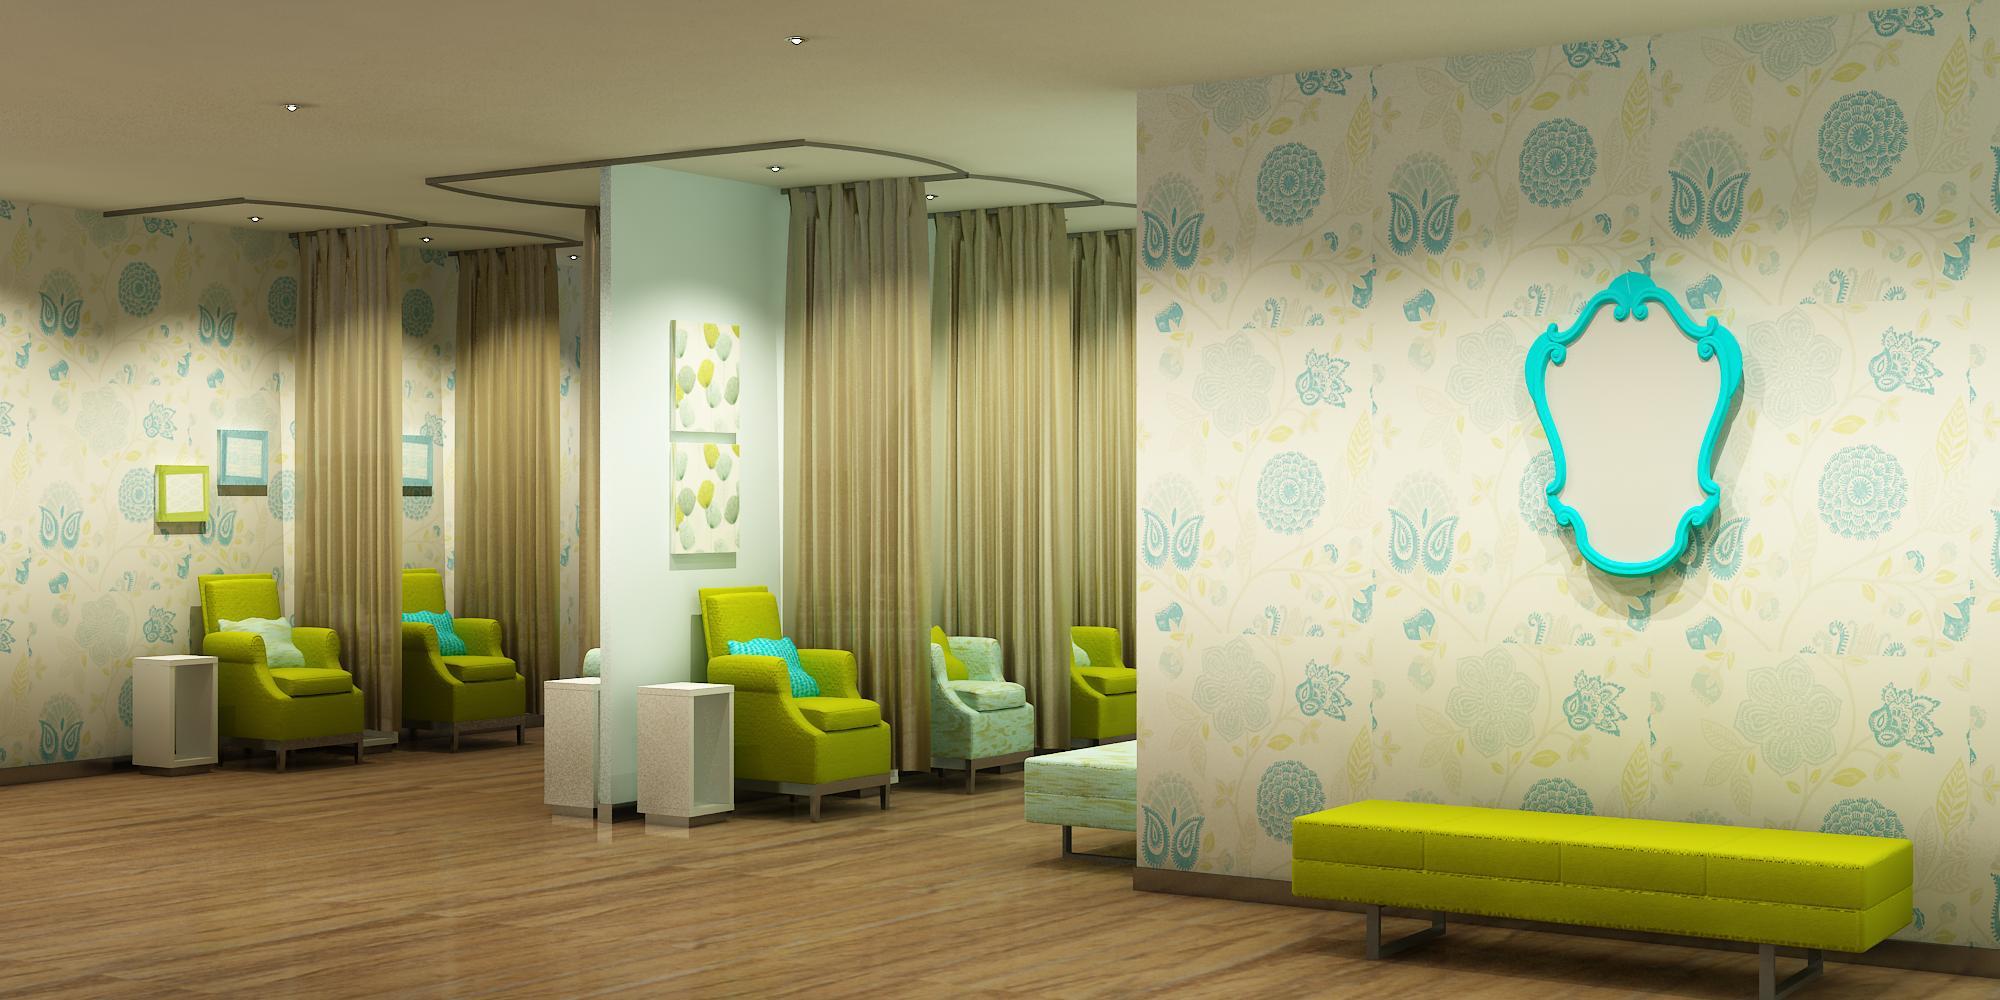 Lactation Room Plaza Mandiri Office By Ayu Nindyakirana